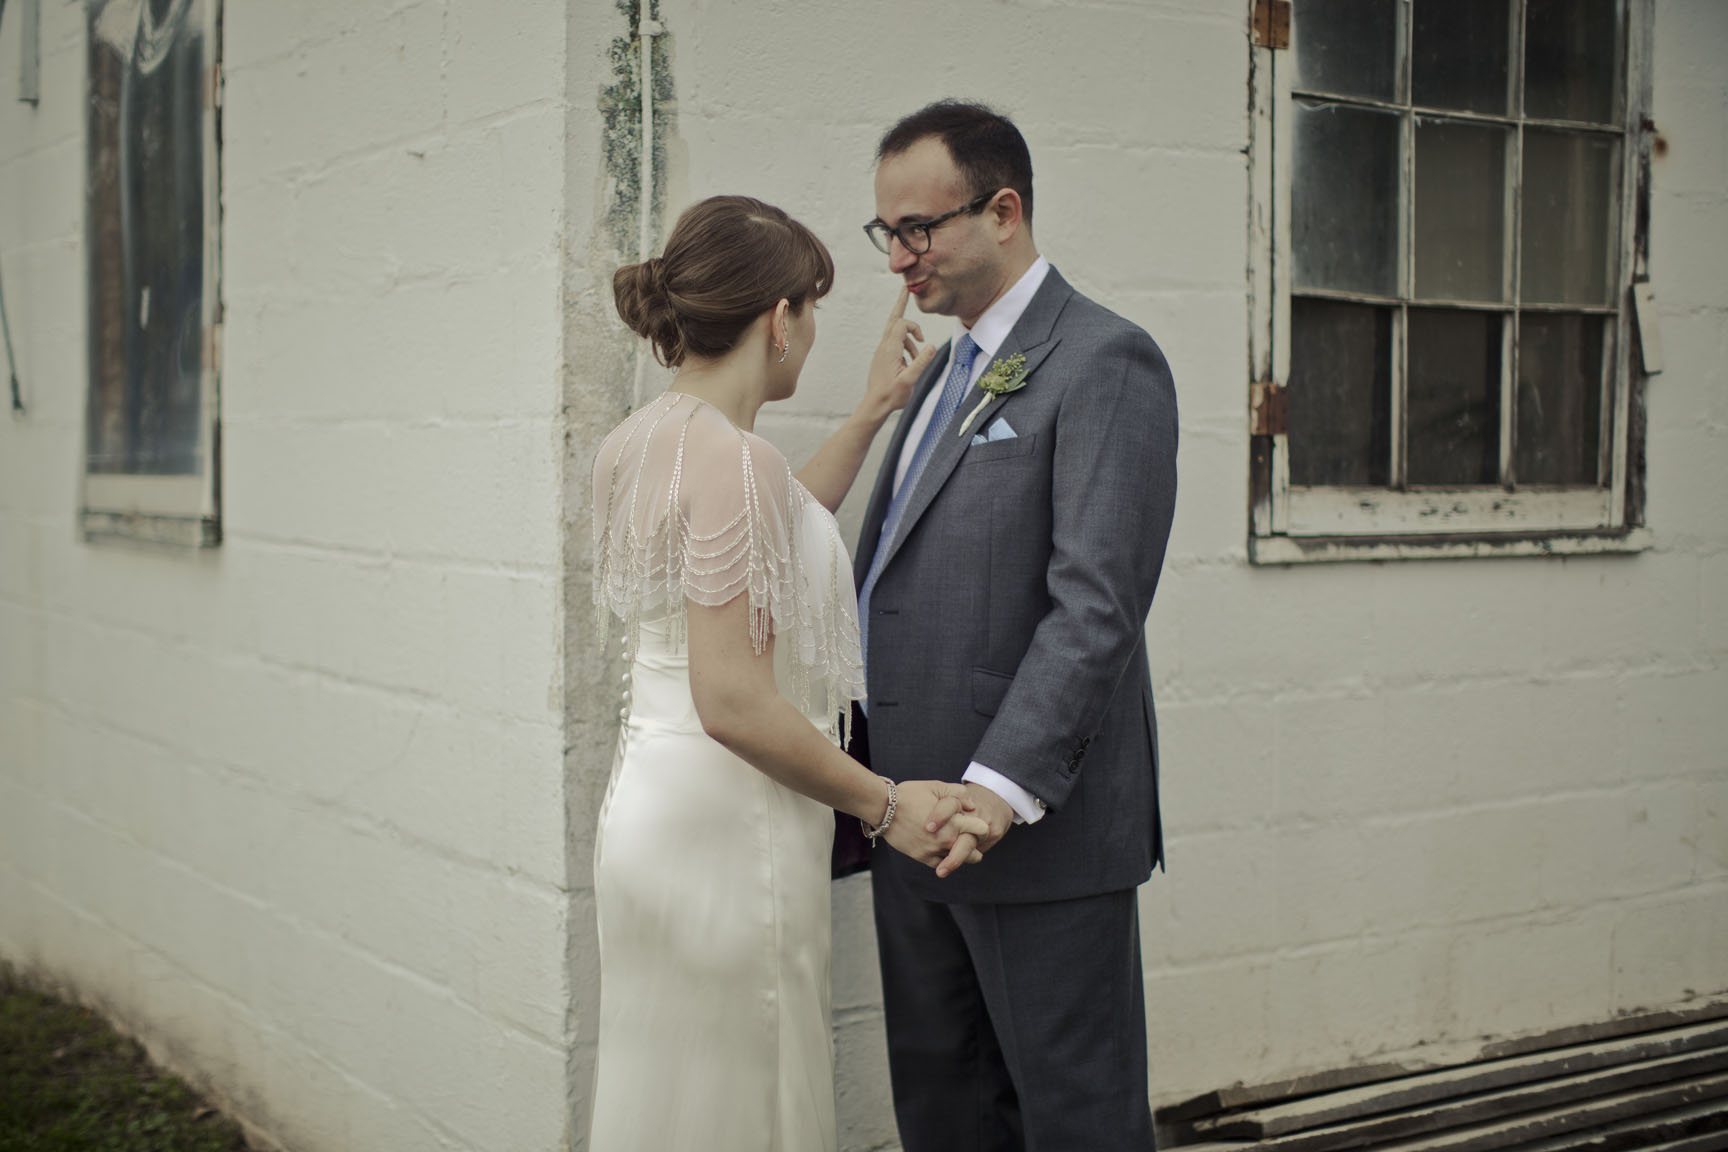 SGP_Alison&Dave_TheStory054